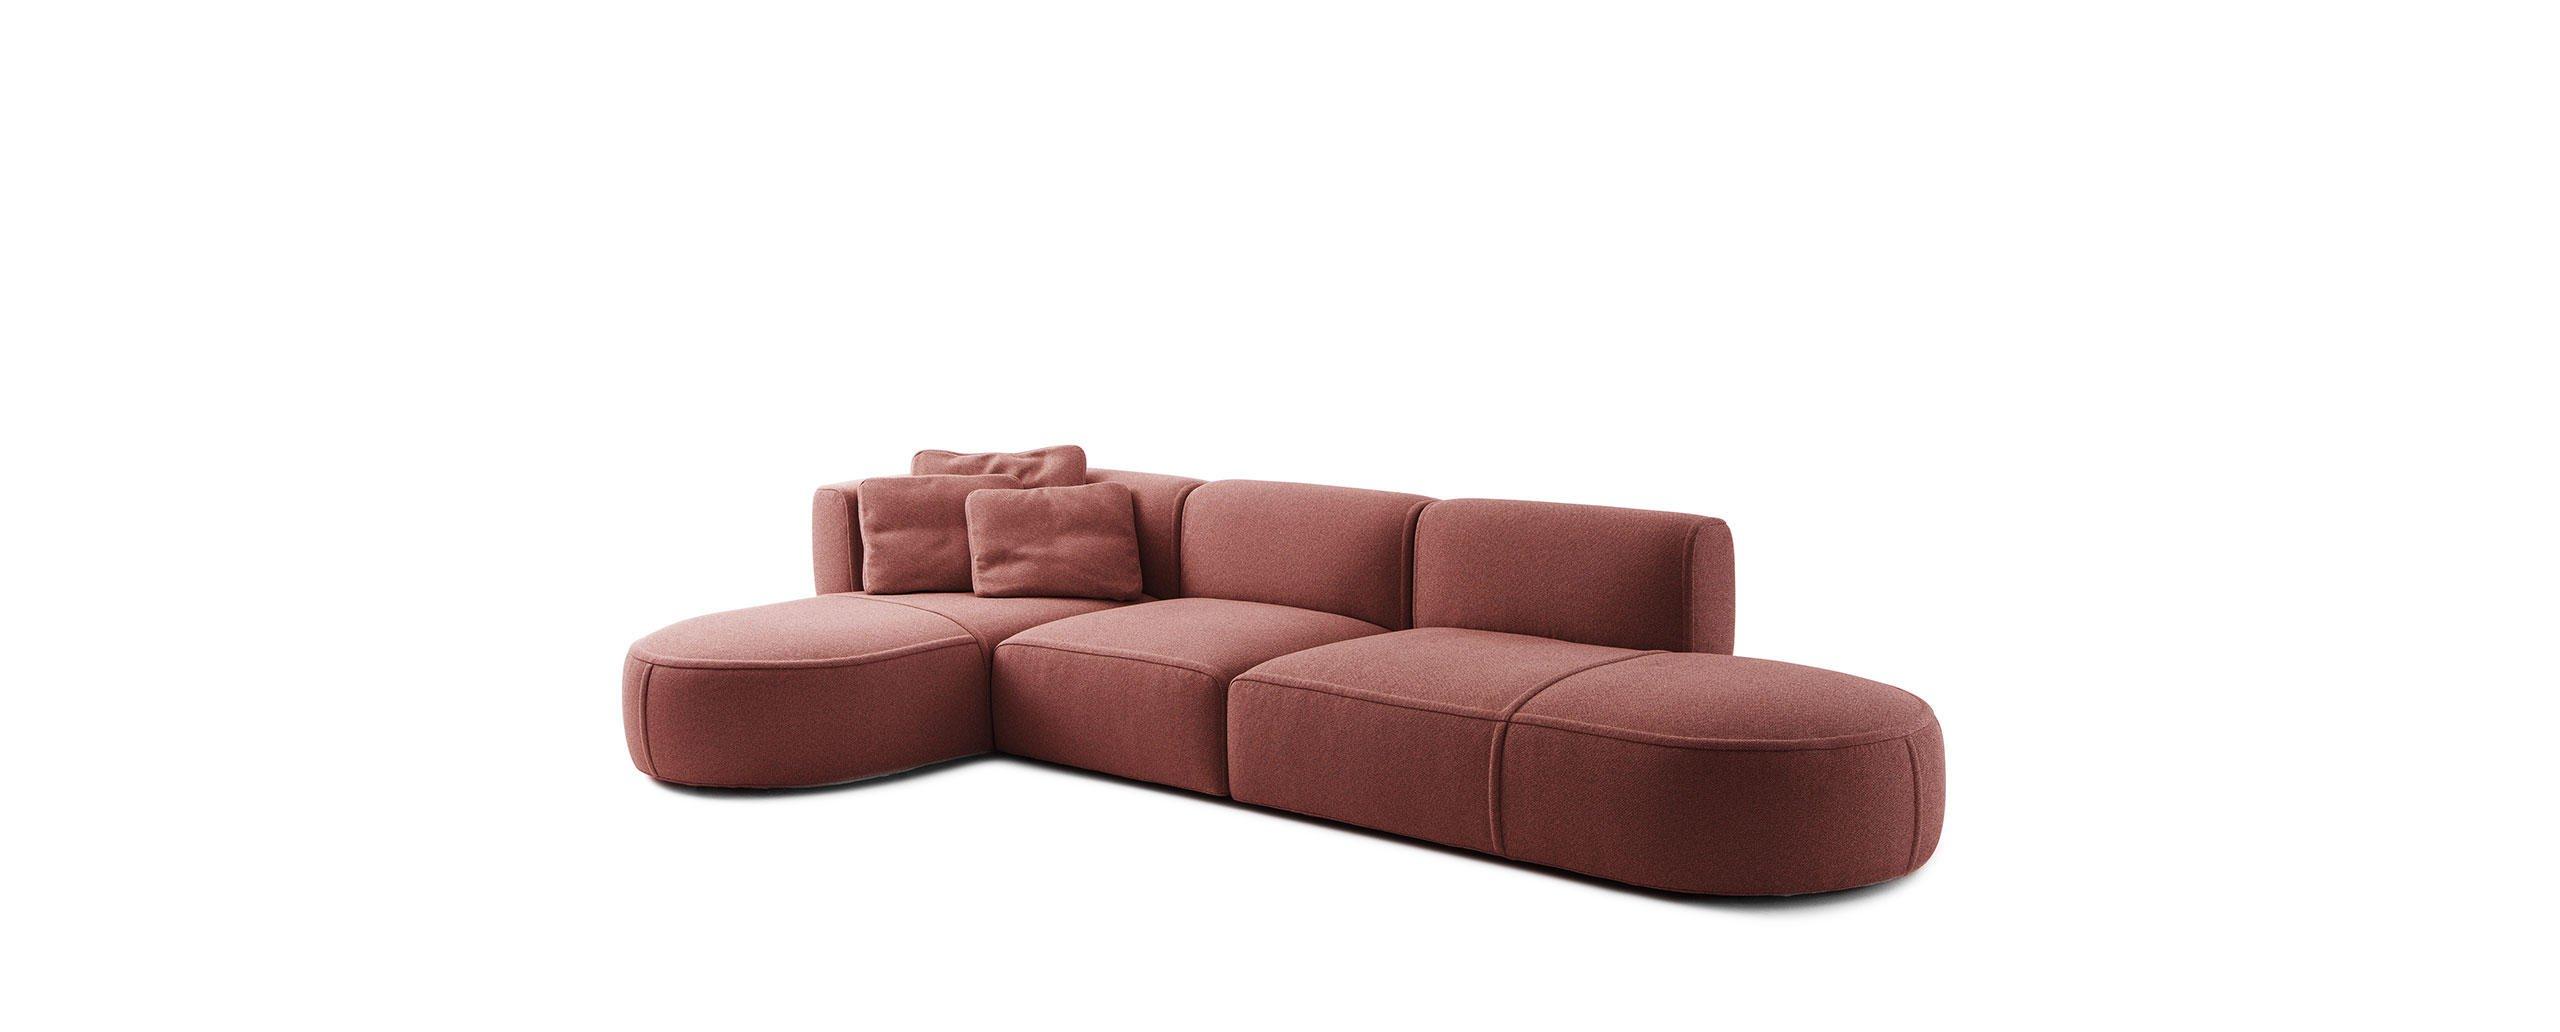 Divano Bowy-sofa